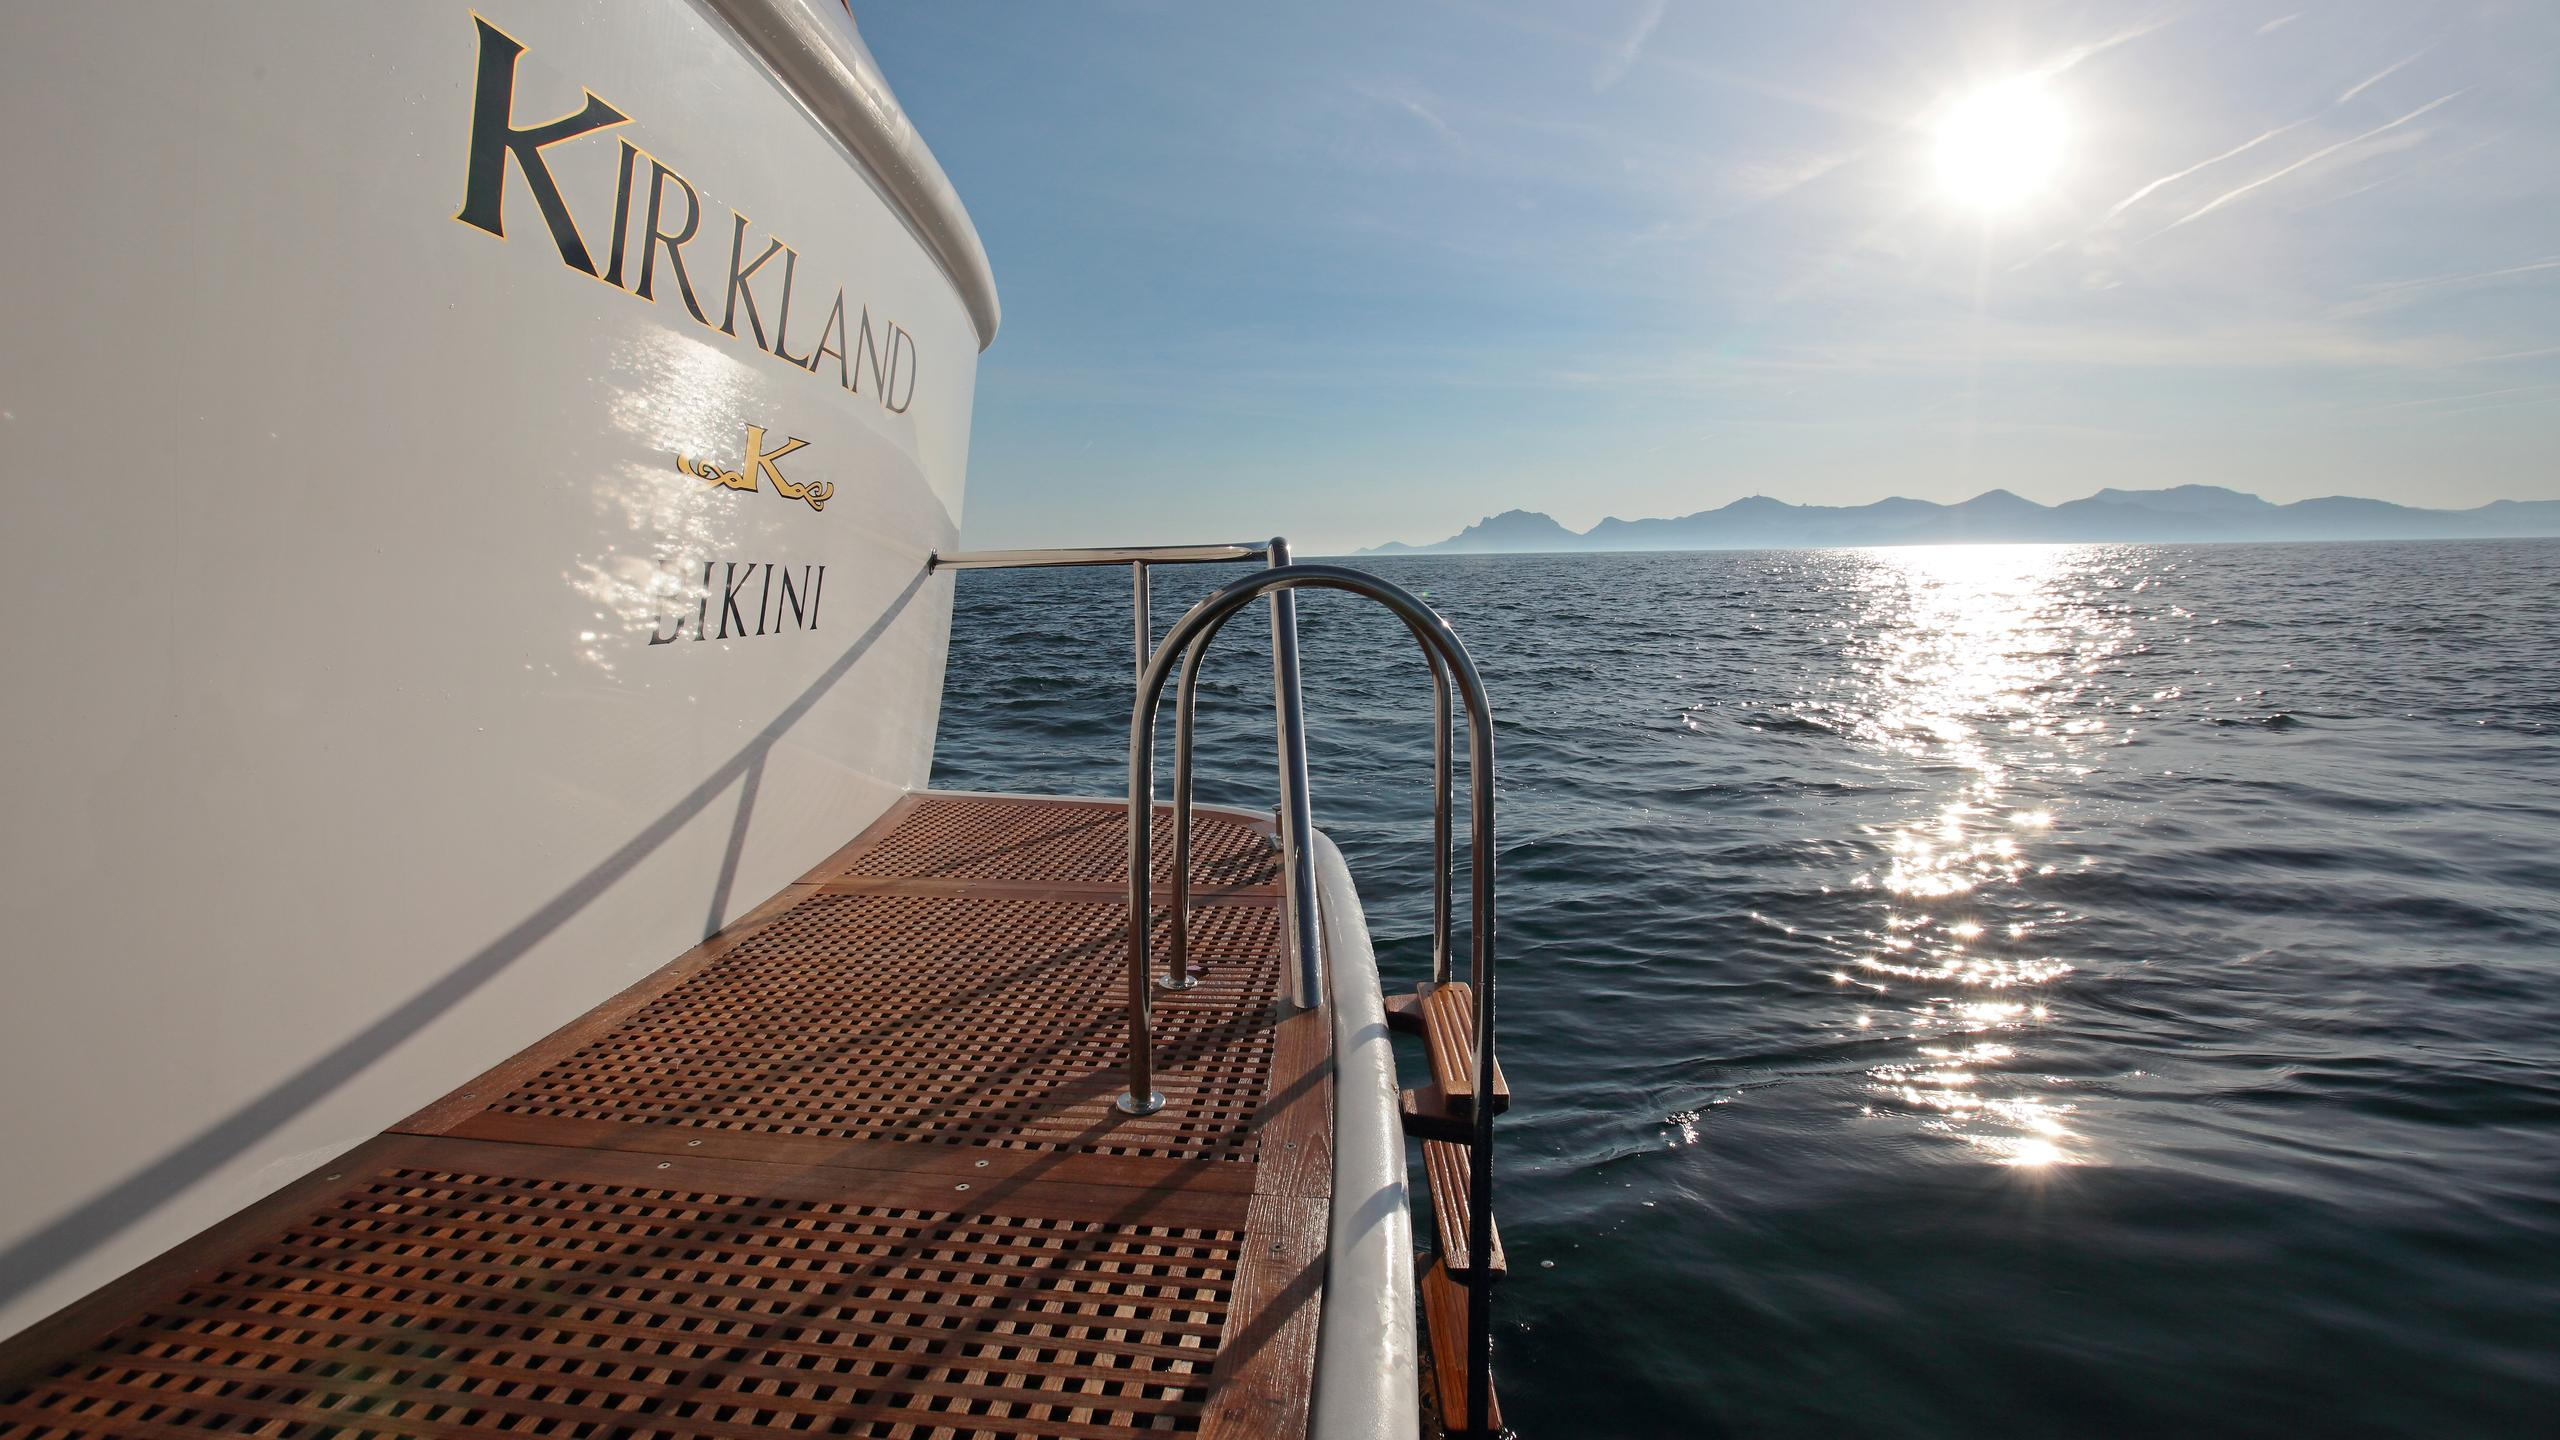 kirkland-yacht-stern